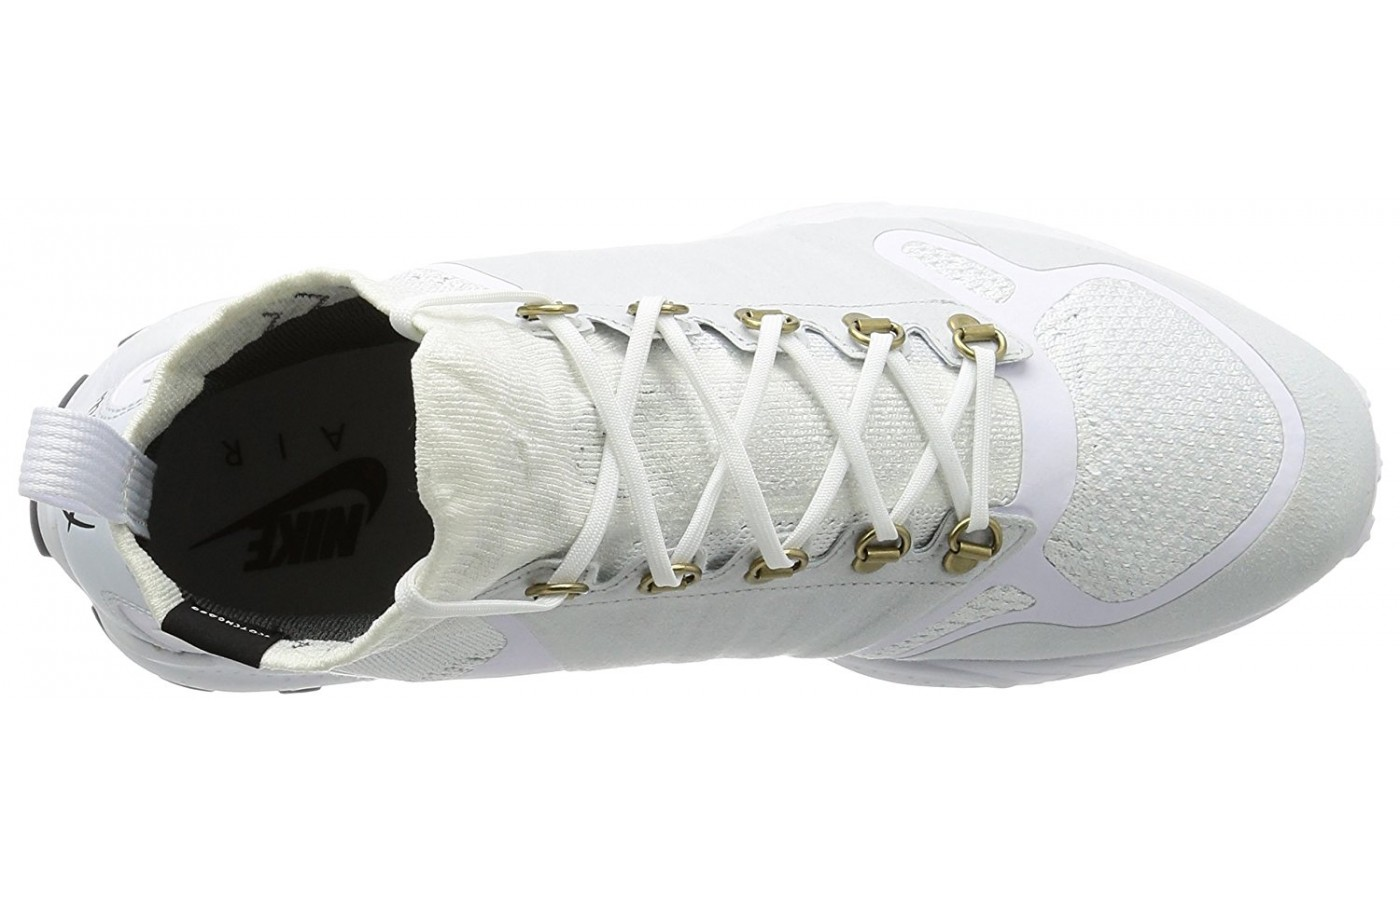 Nike Zoom Talaria Flyknit Upper